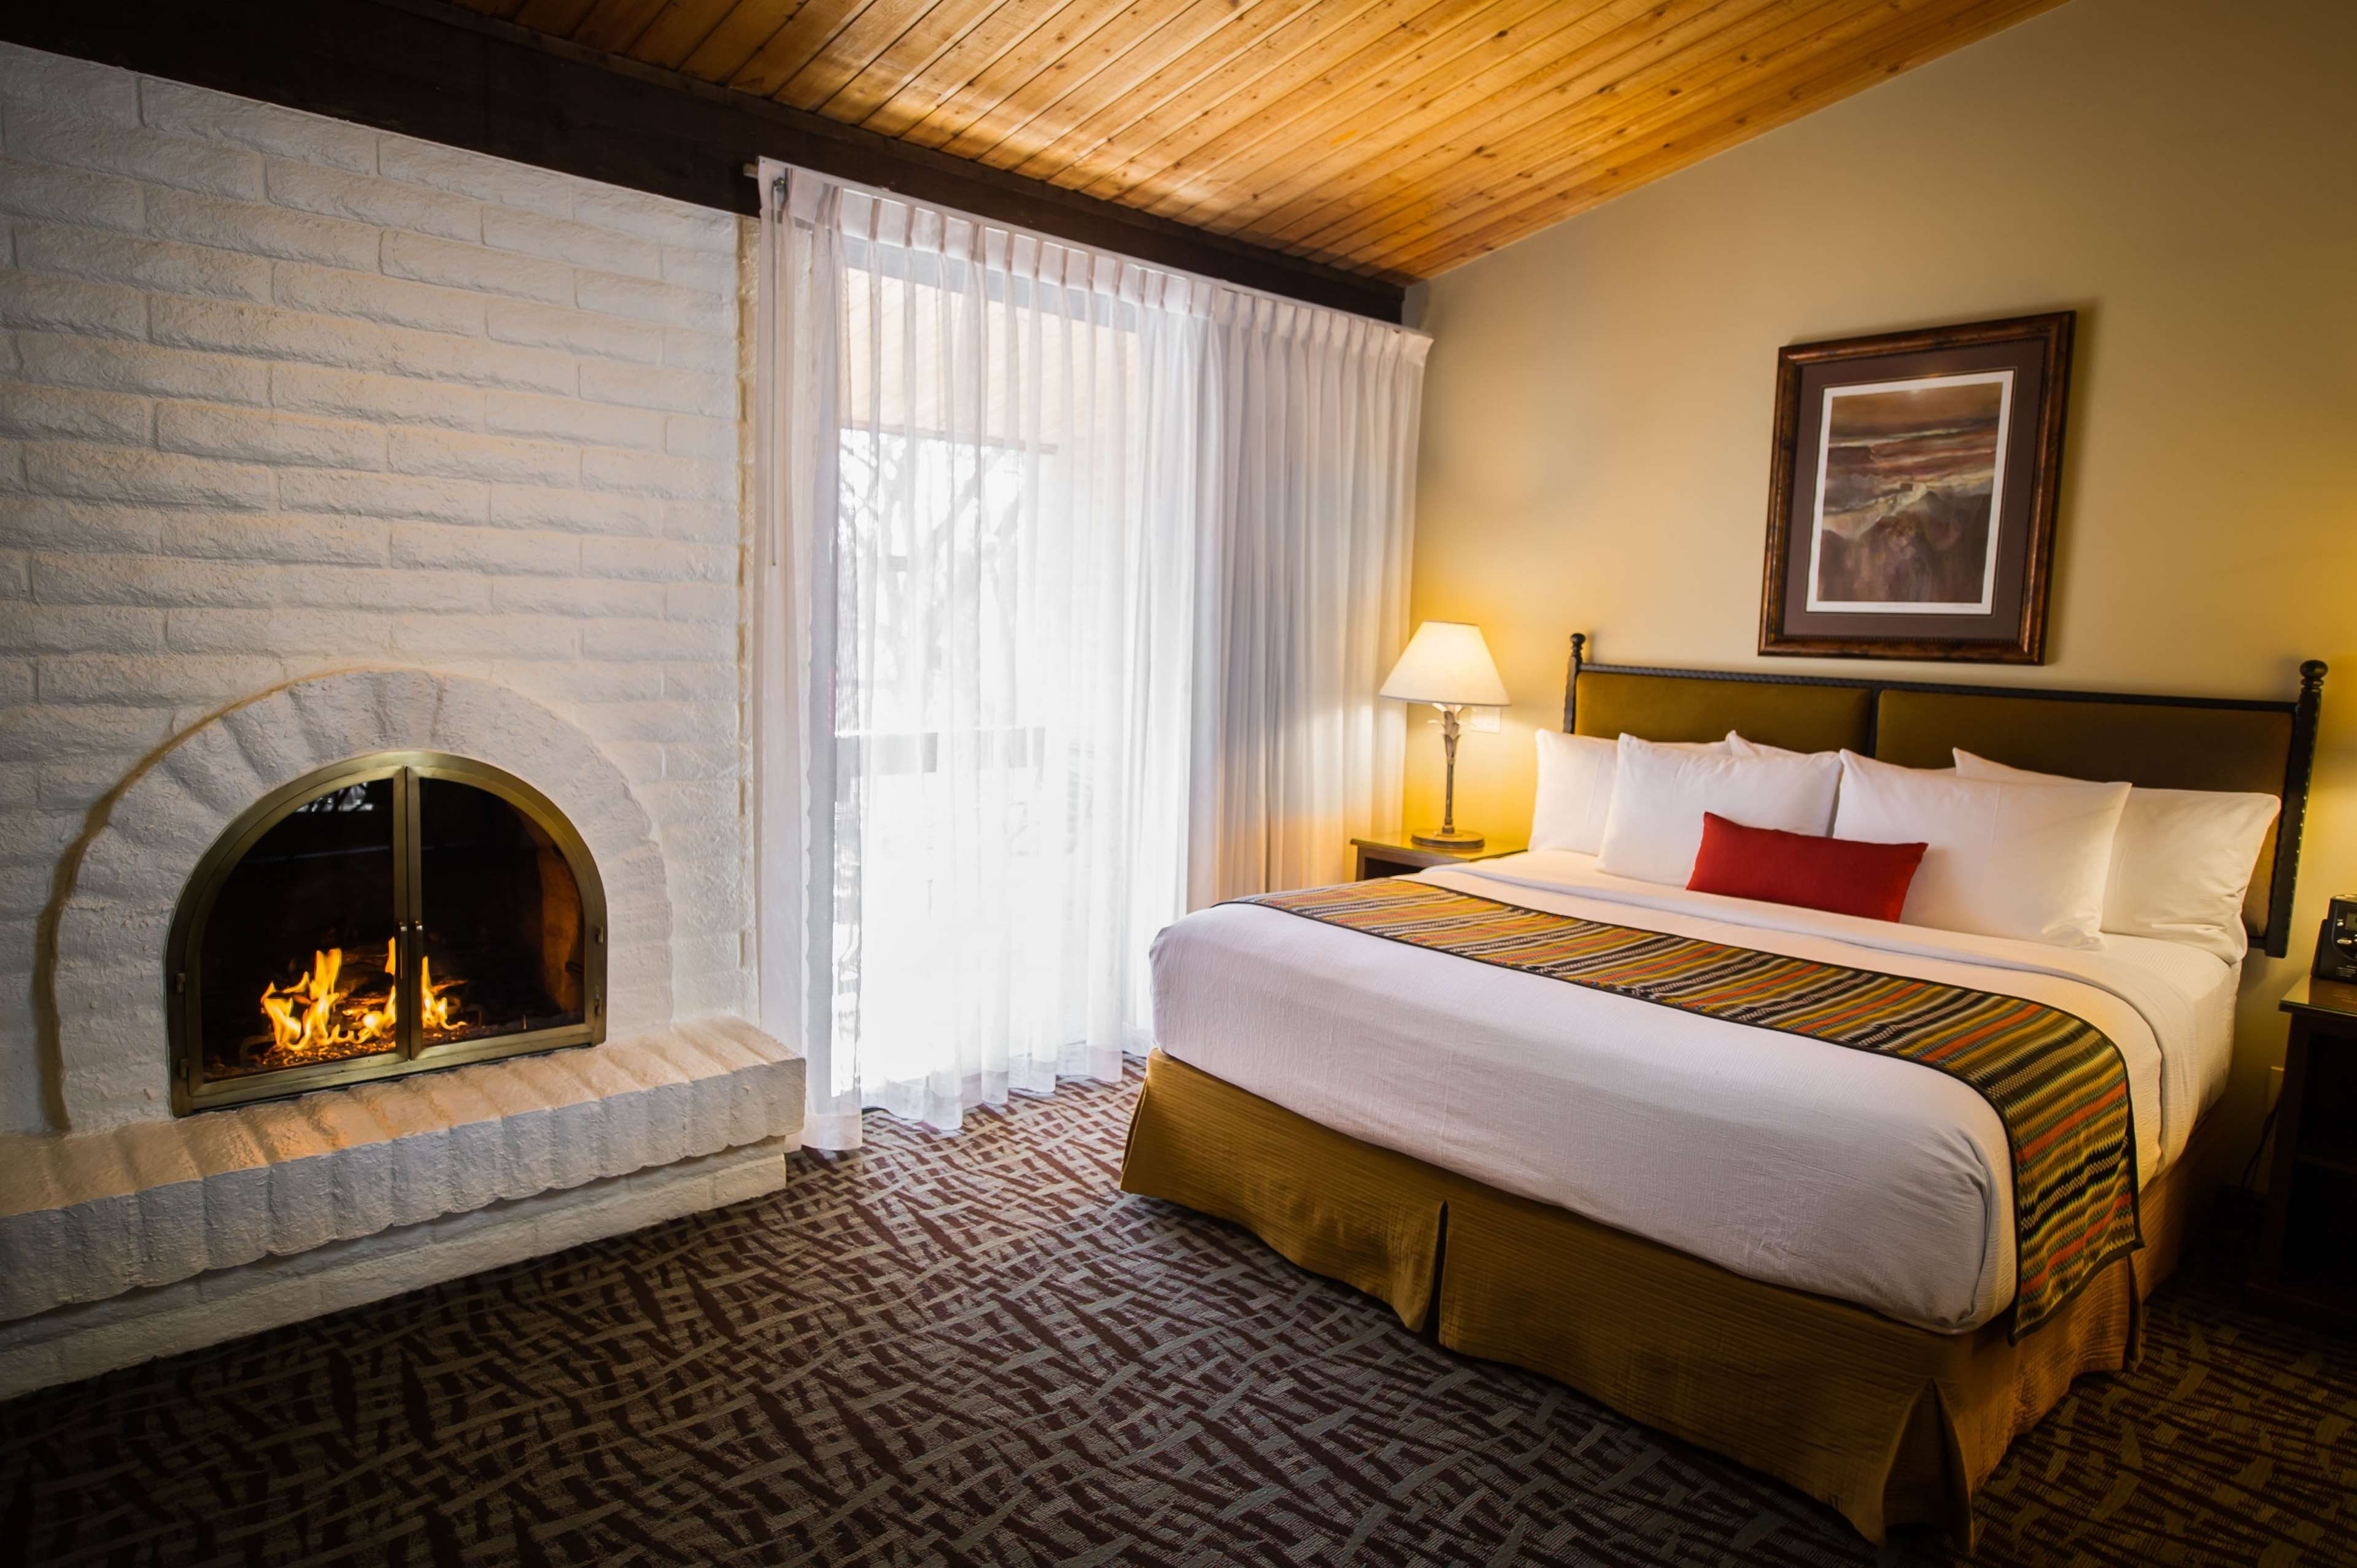 Best Western Plus Arroyo Roble Hotel & Creekside Villas image 29